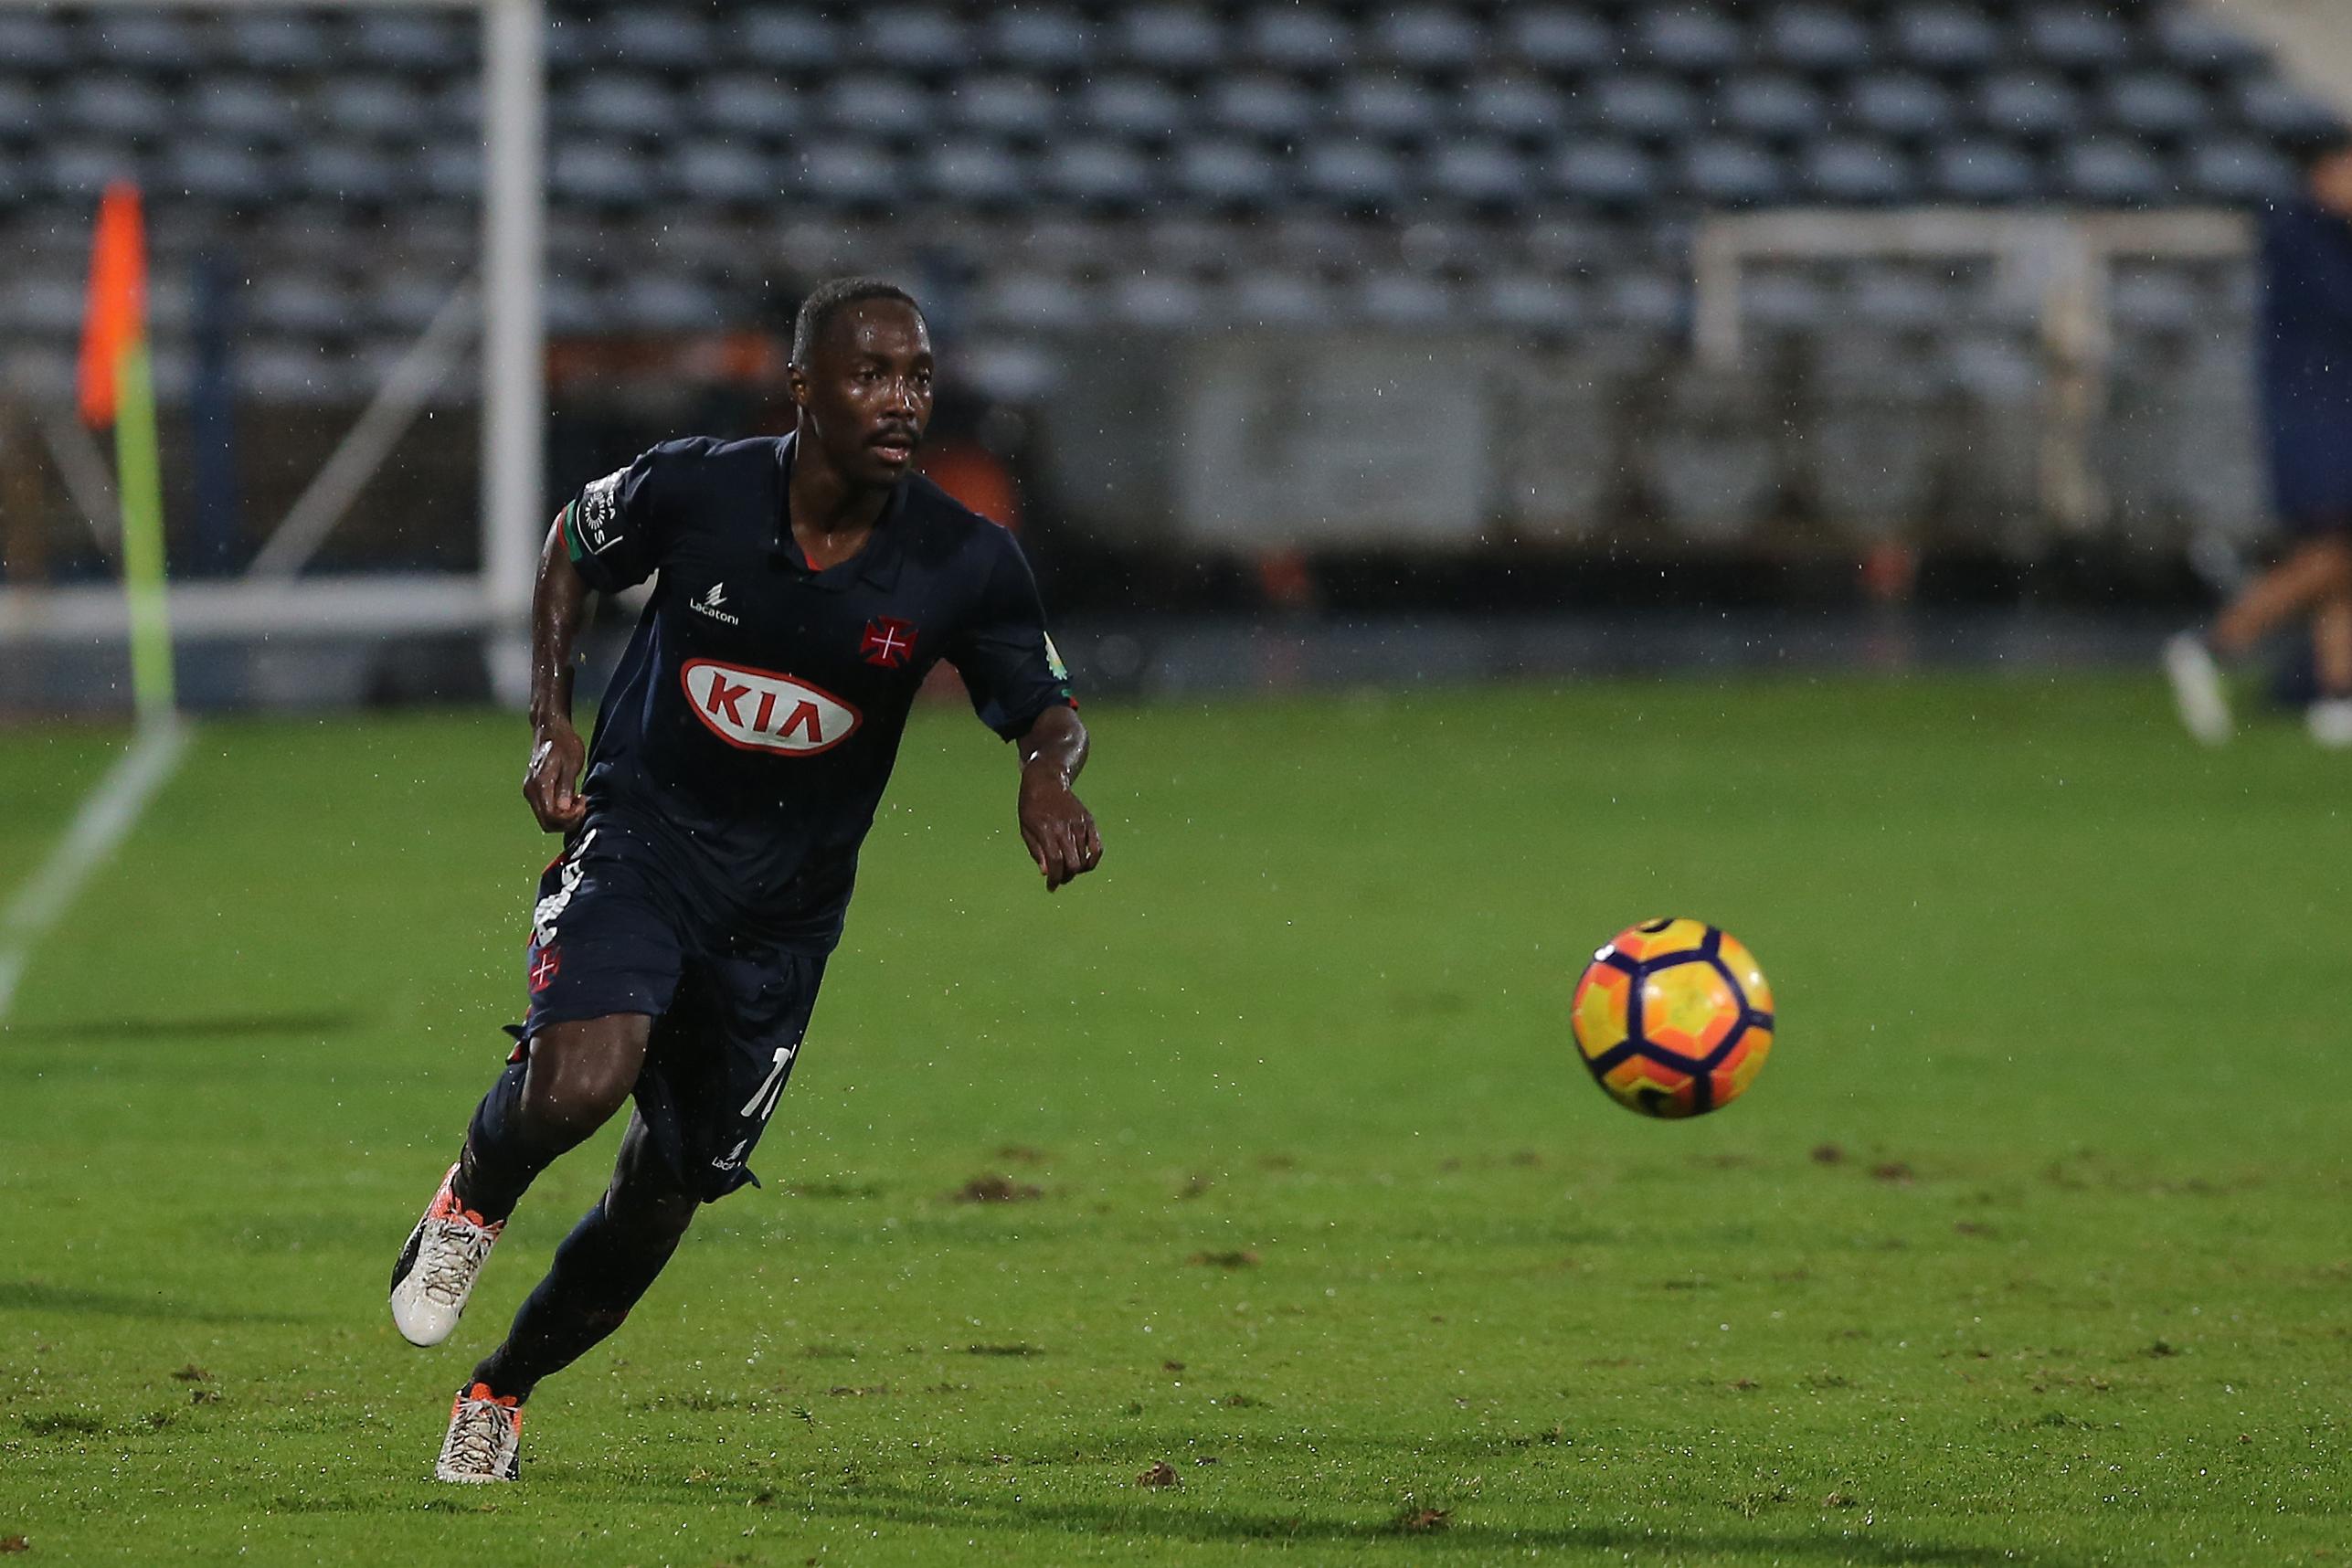 Os Belenenses v FC Porto - Premier League 2016/17